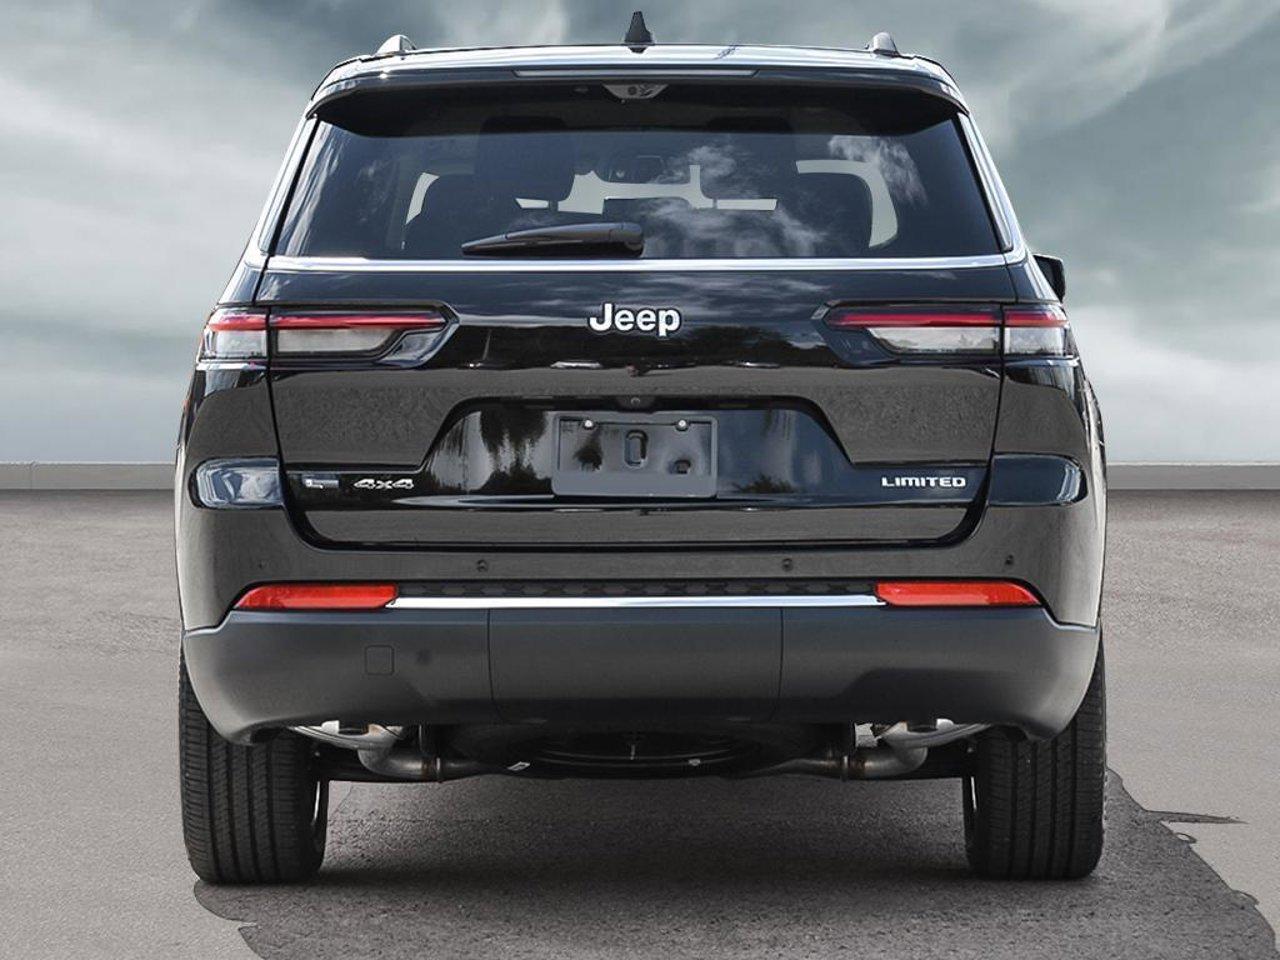 Jeep Grand Cherokee L 2021 Ottawa & Gatineau - photo #4